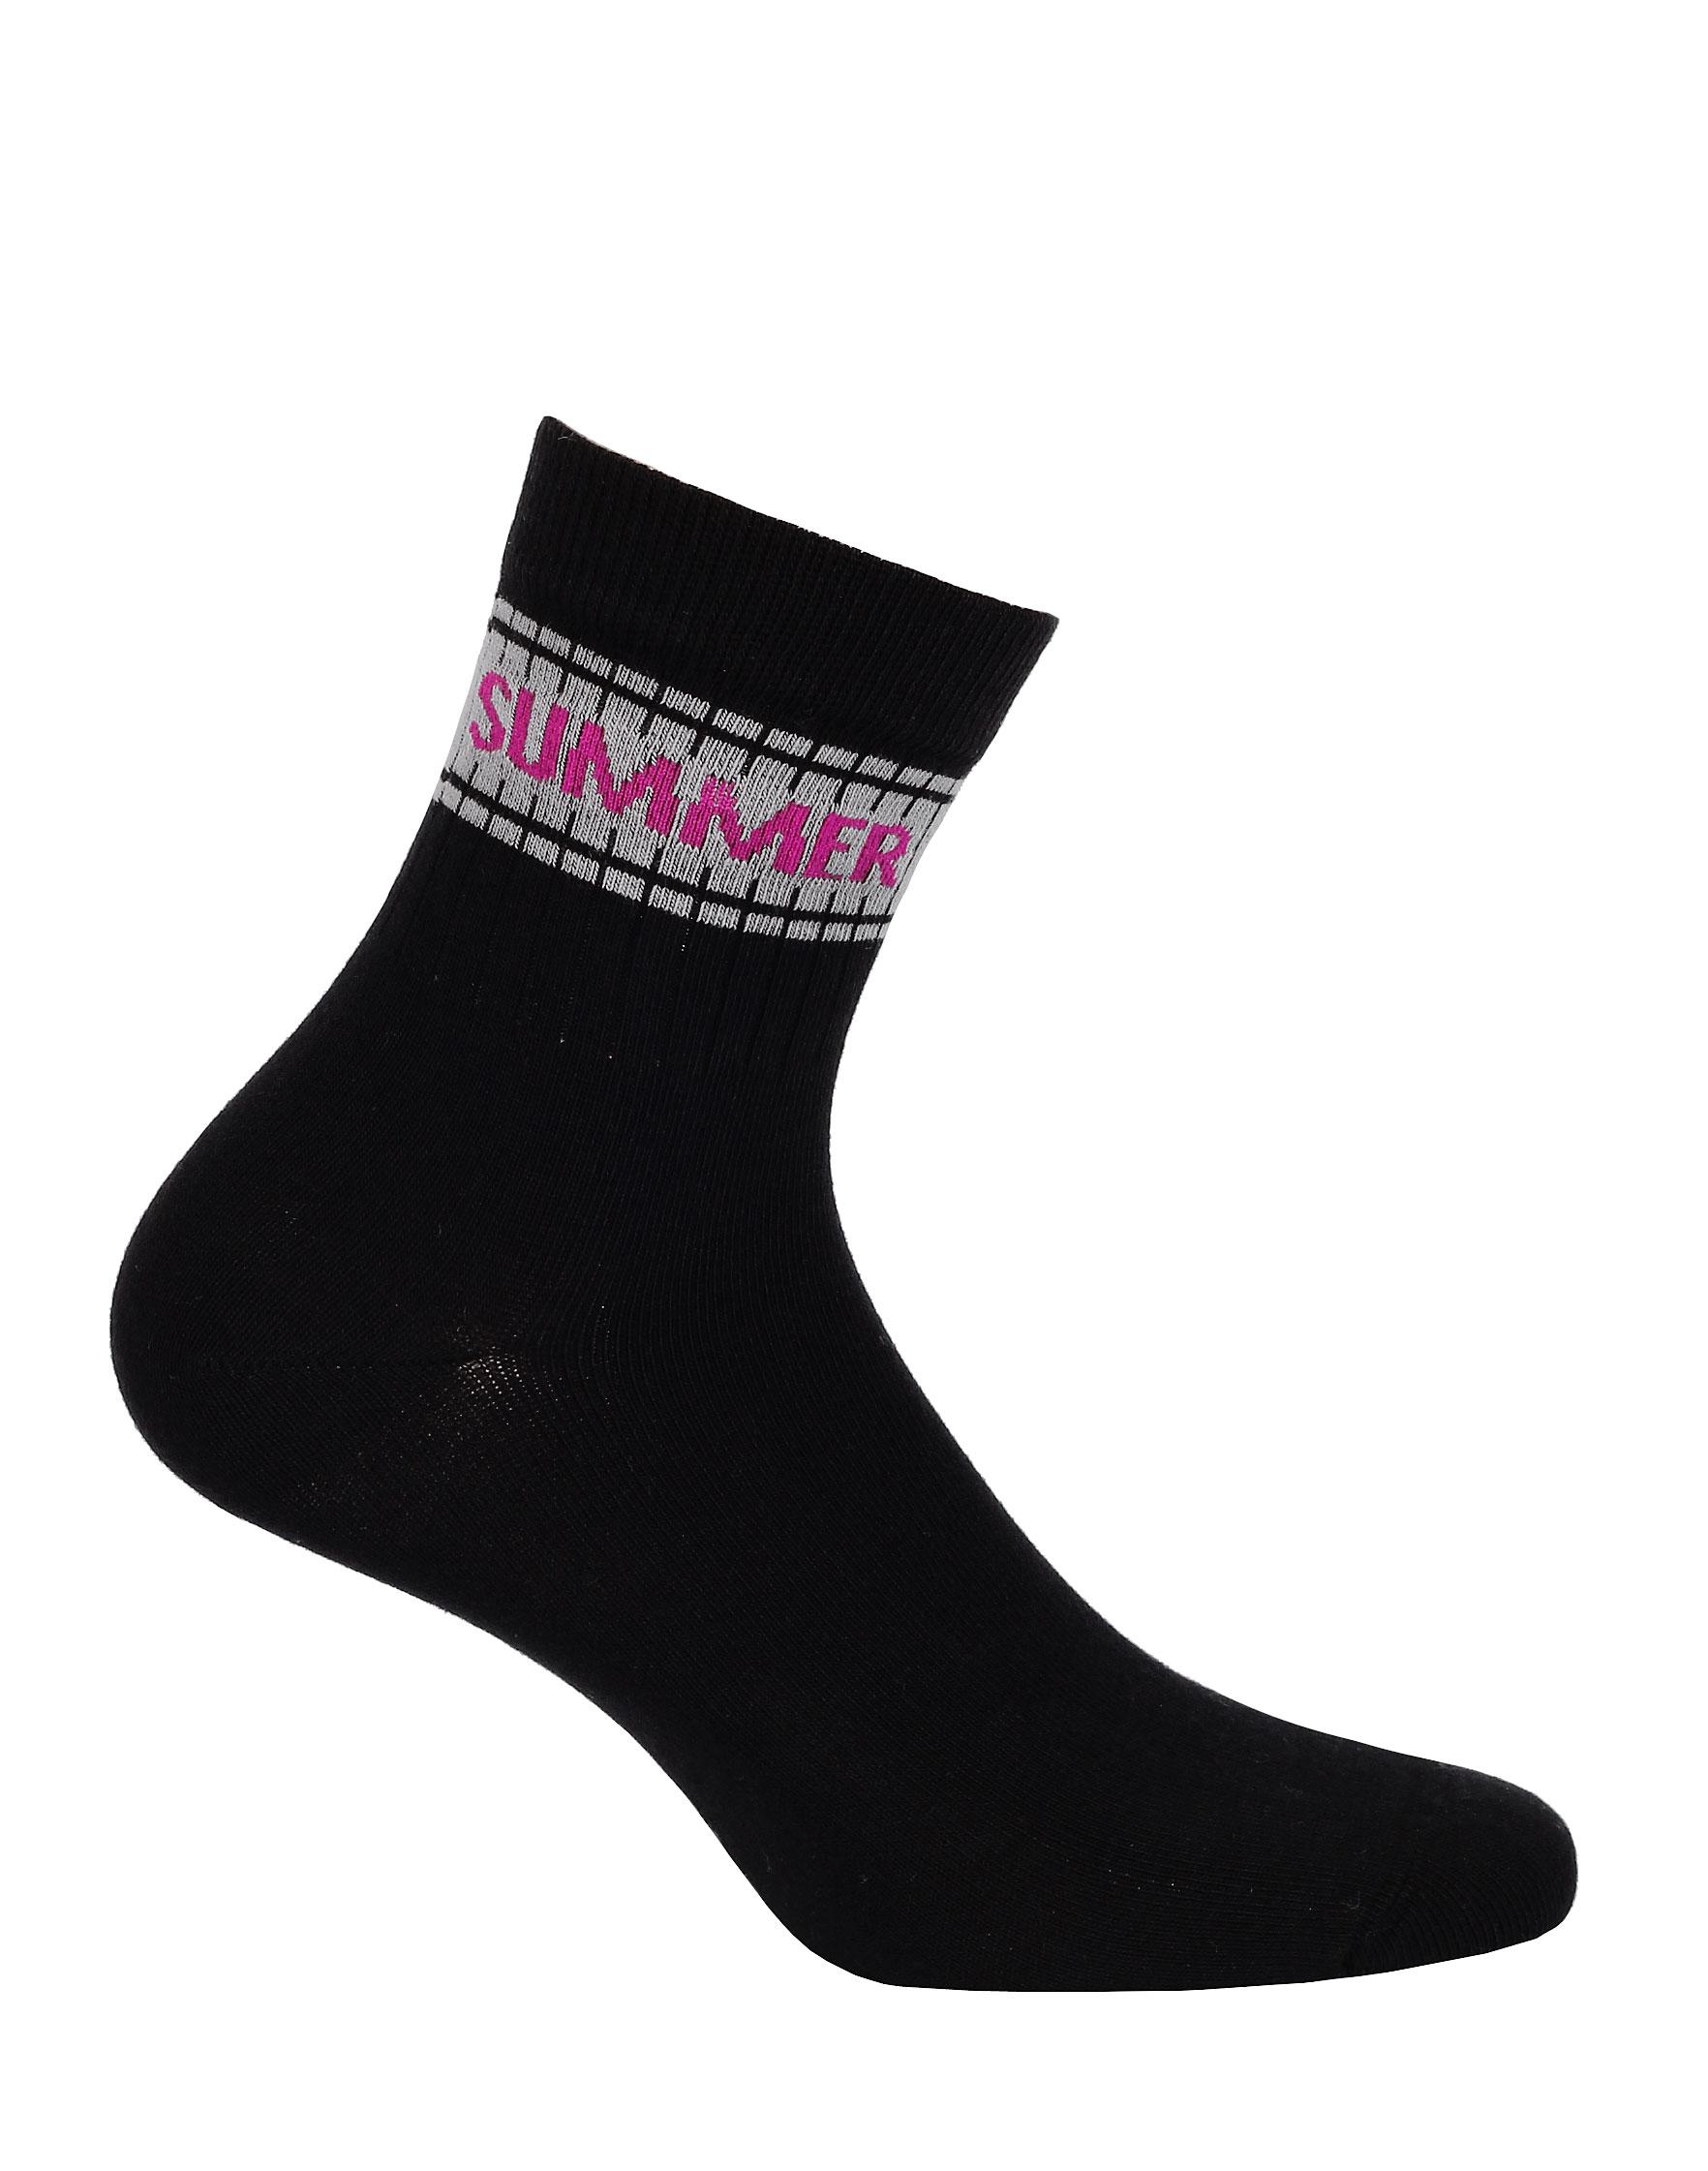 dětské ponožky vzor GATTA SUMMER 33-35